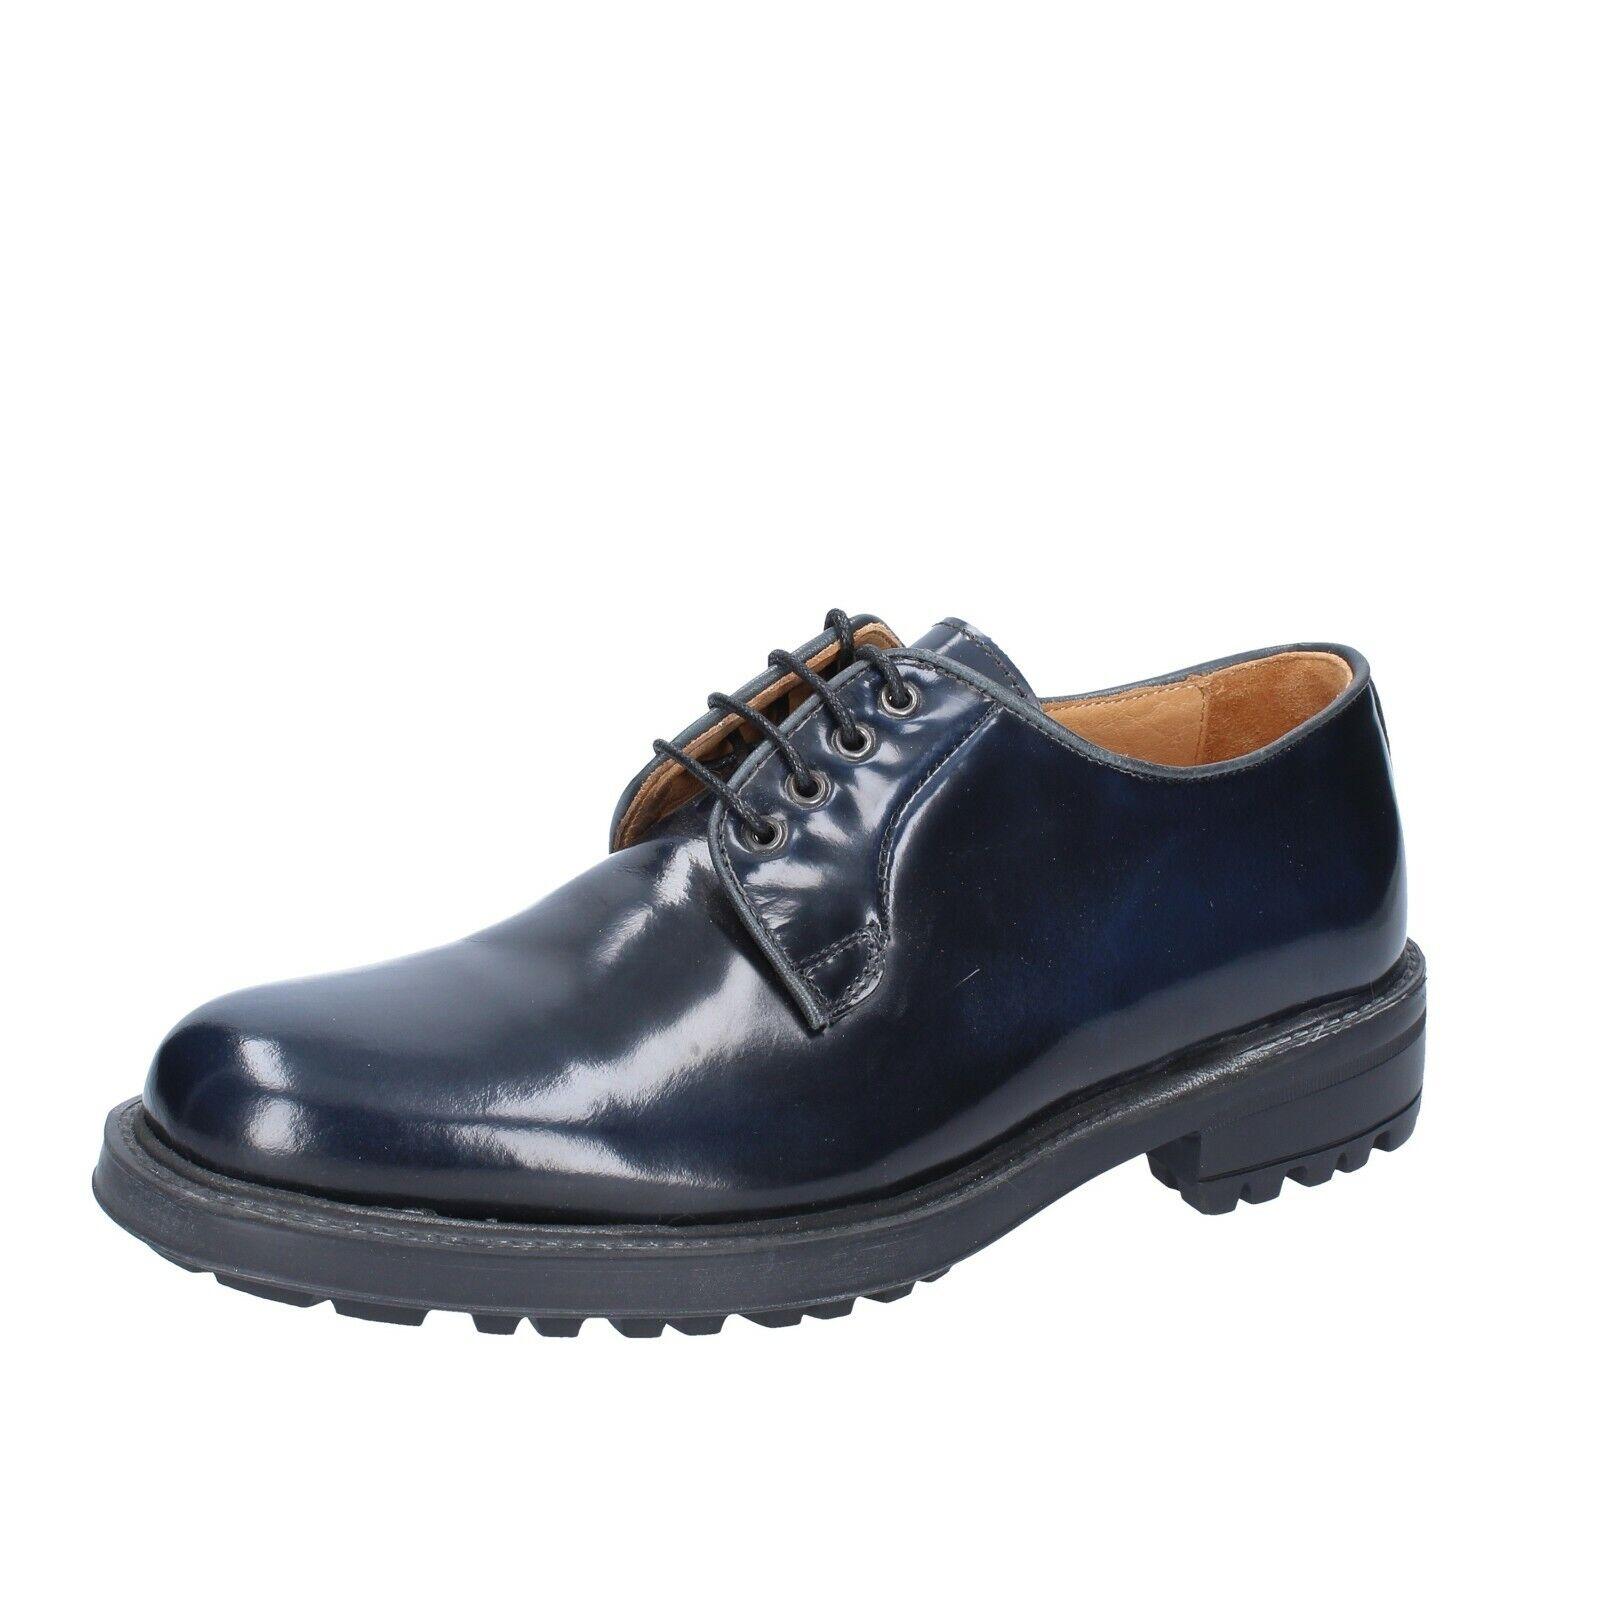 moda classica Uomo scarpe ZENITH 6 (EU 39) elegant blu blu blu shiny leather BS619  vendita online